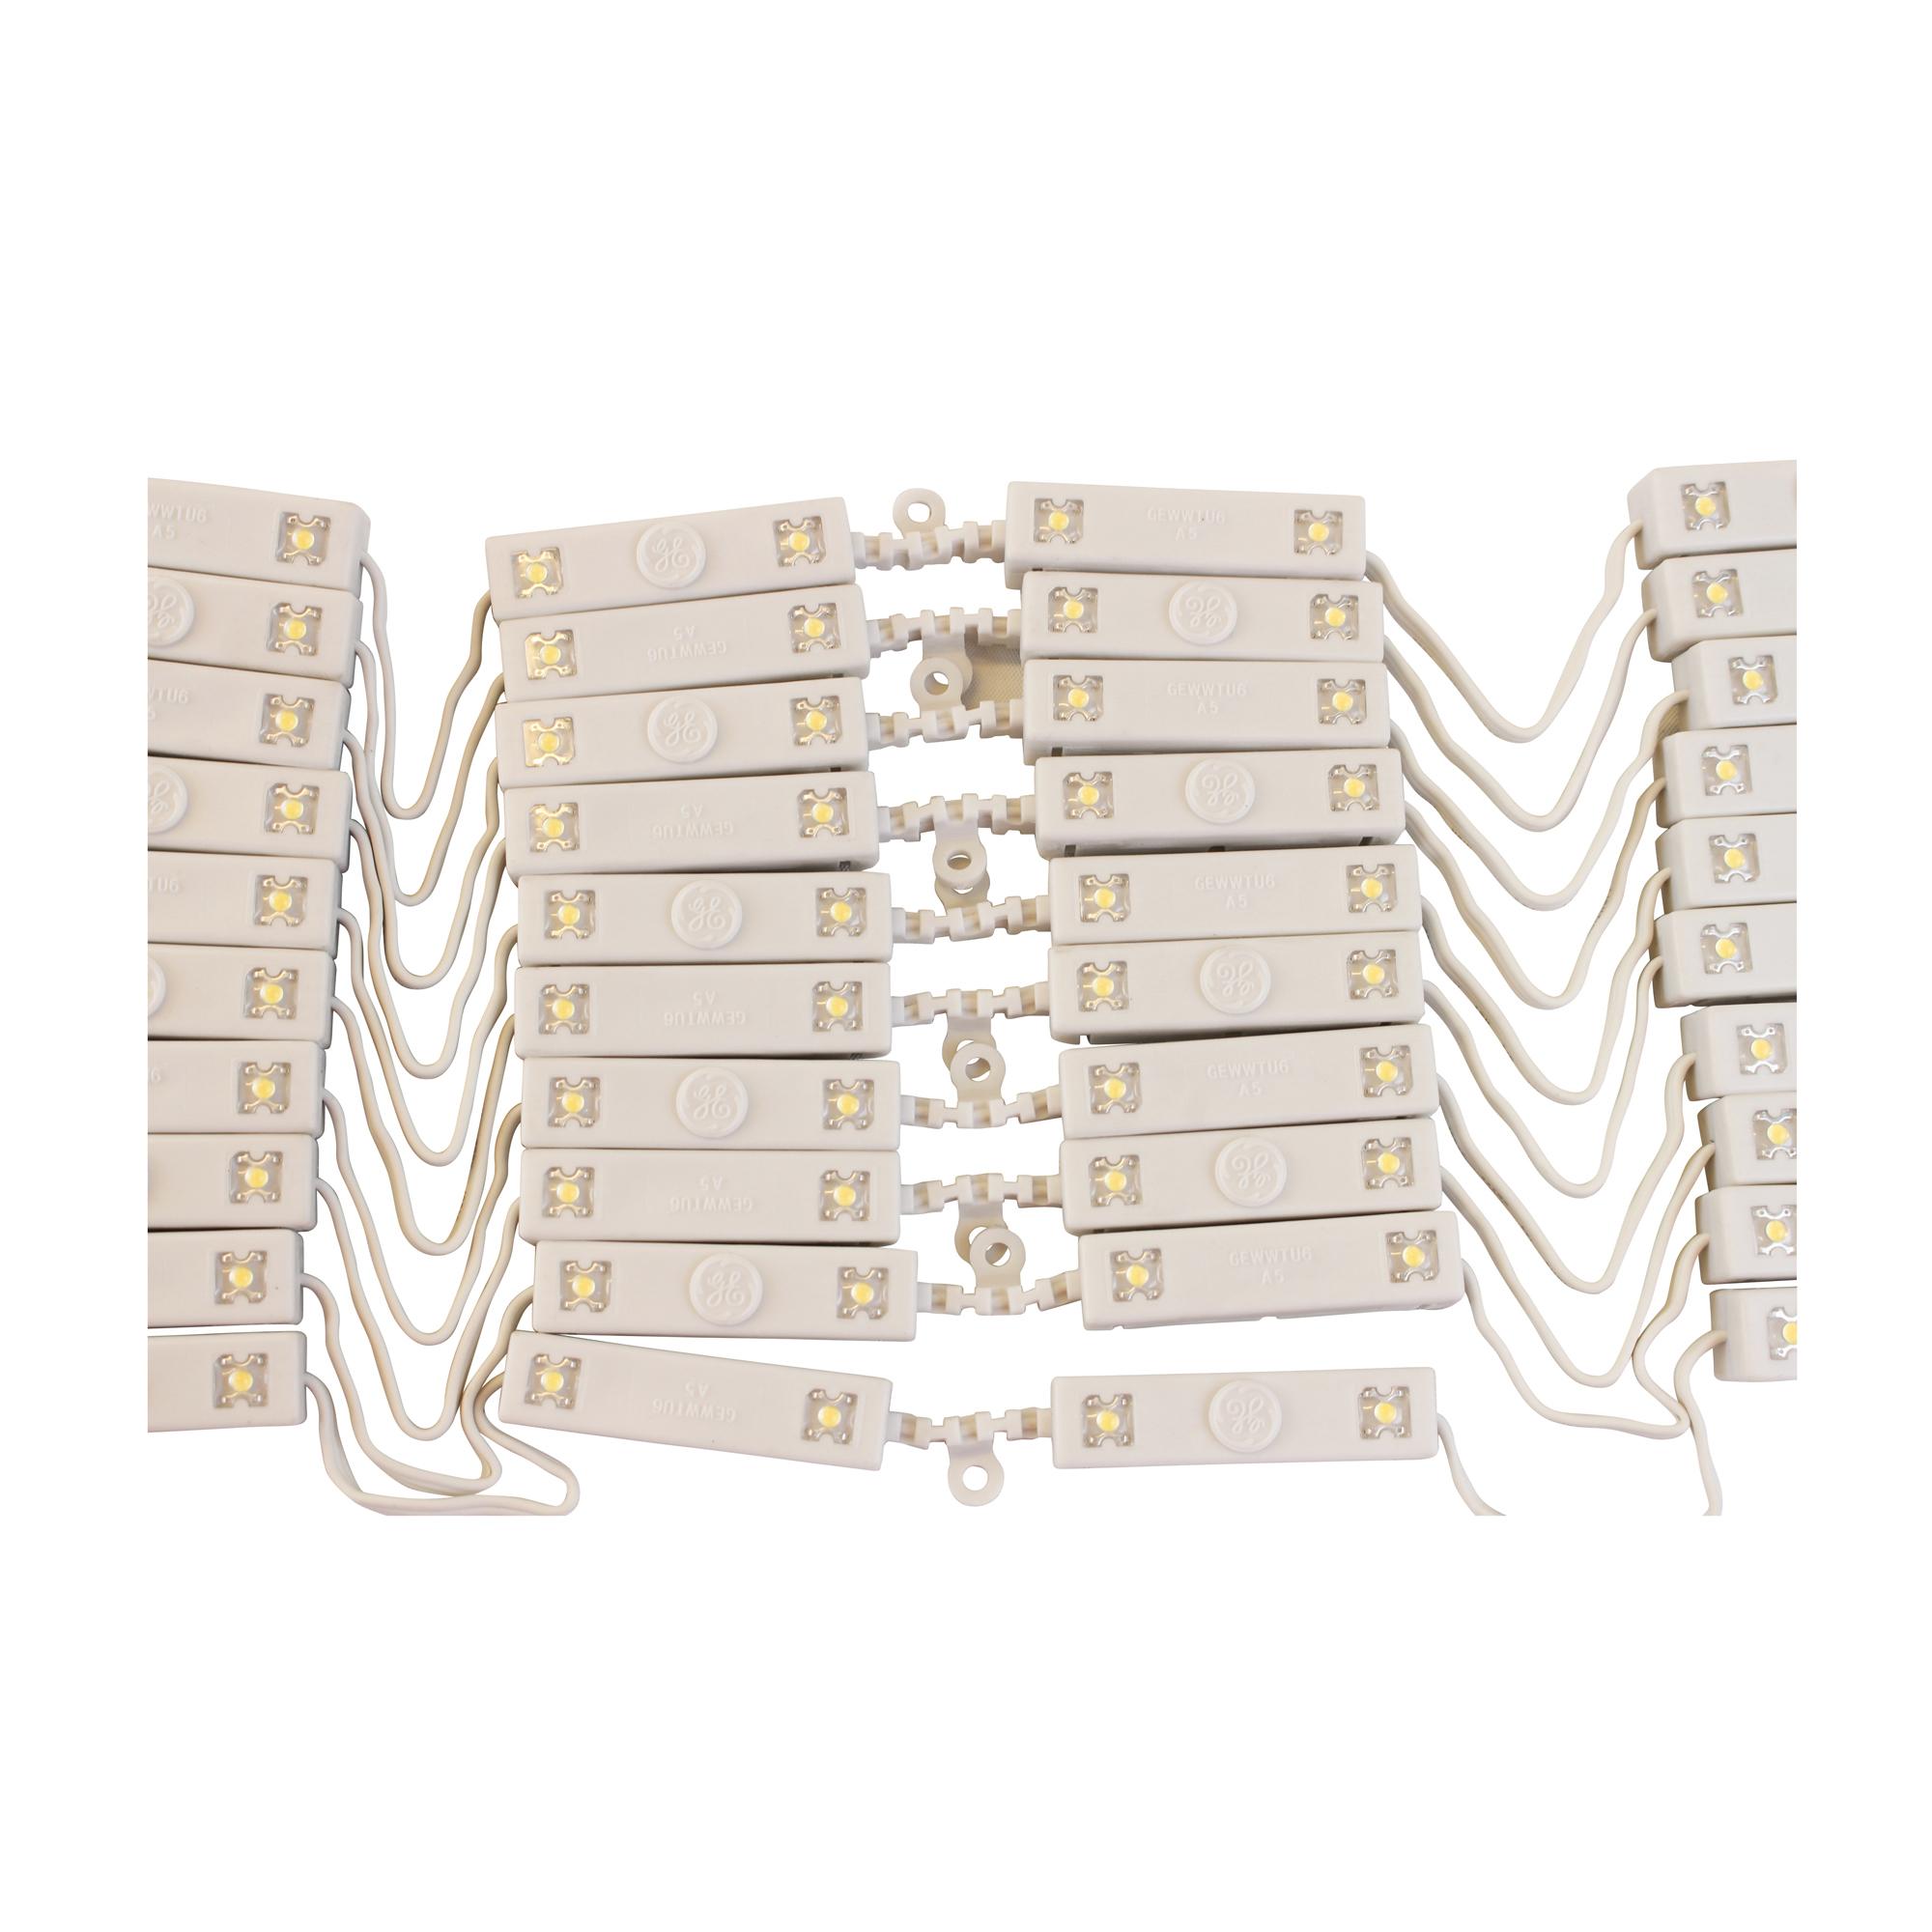 Ge led light strip 10432